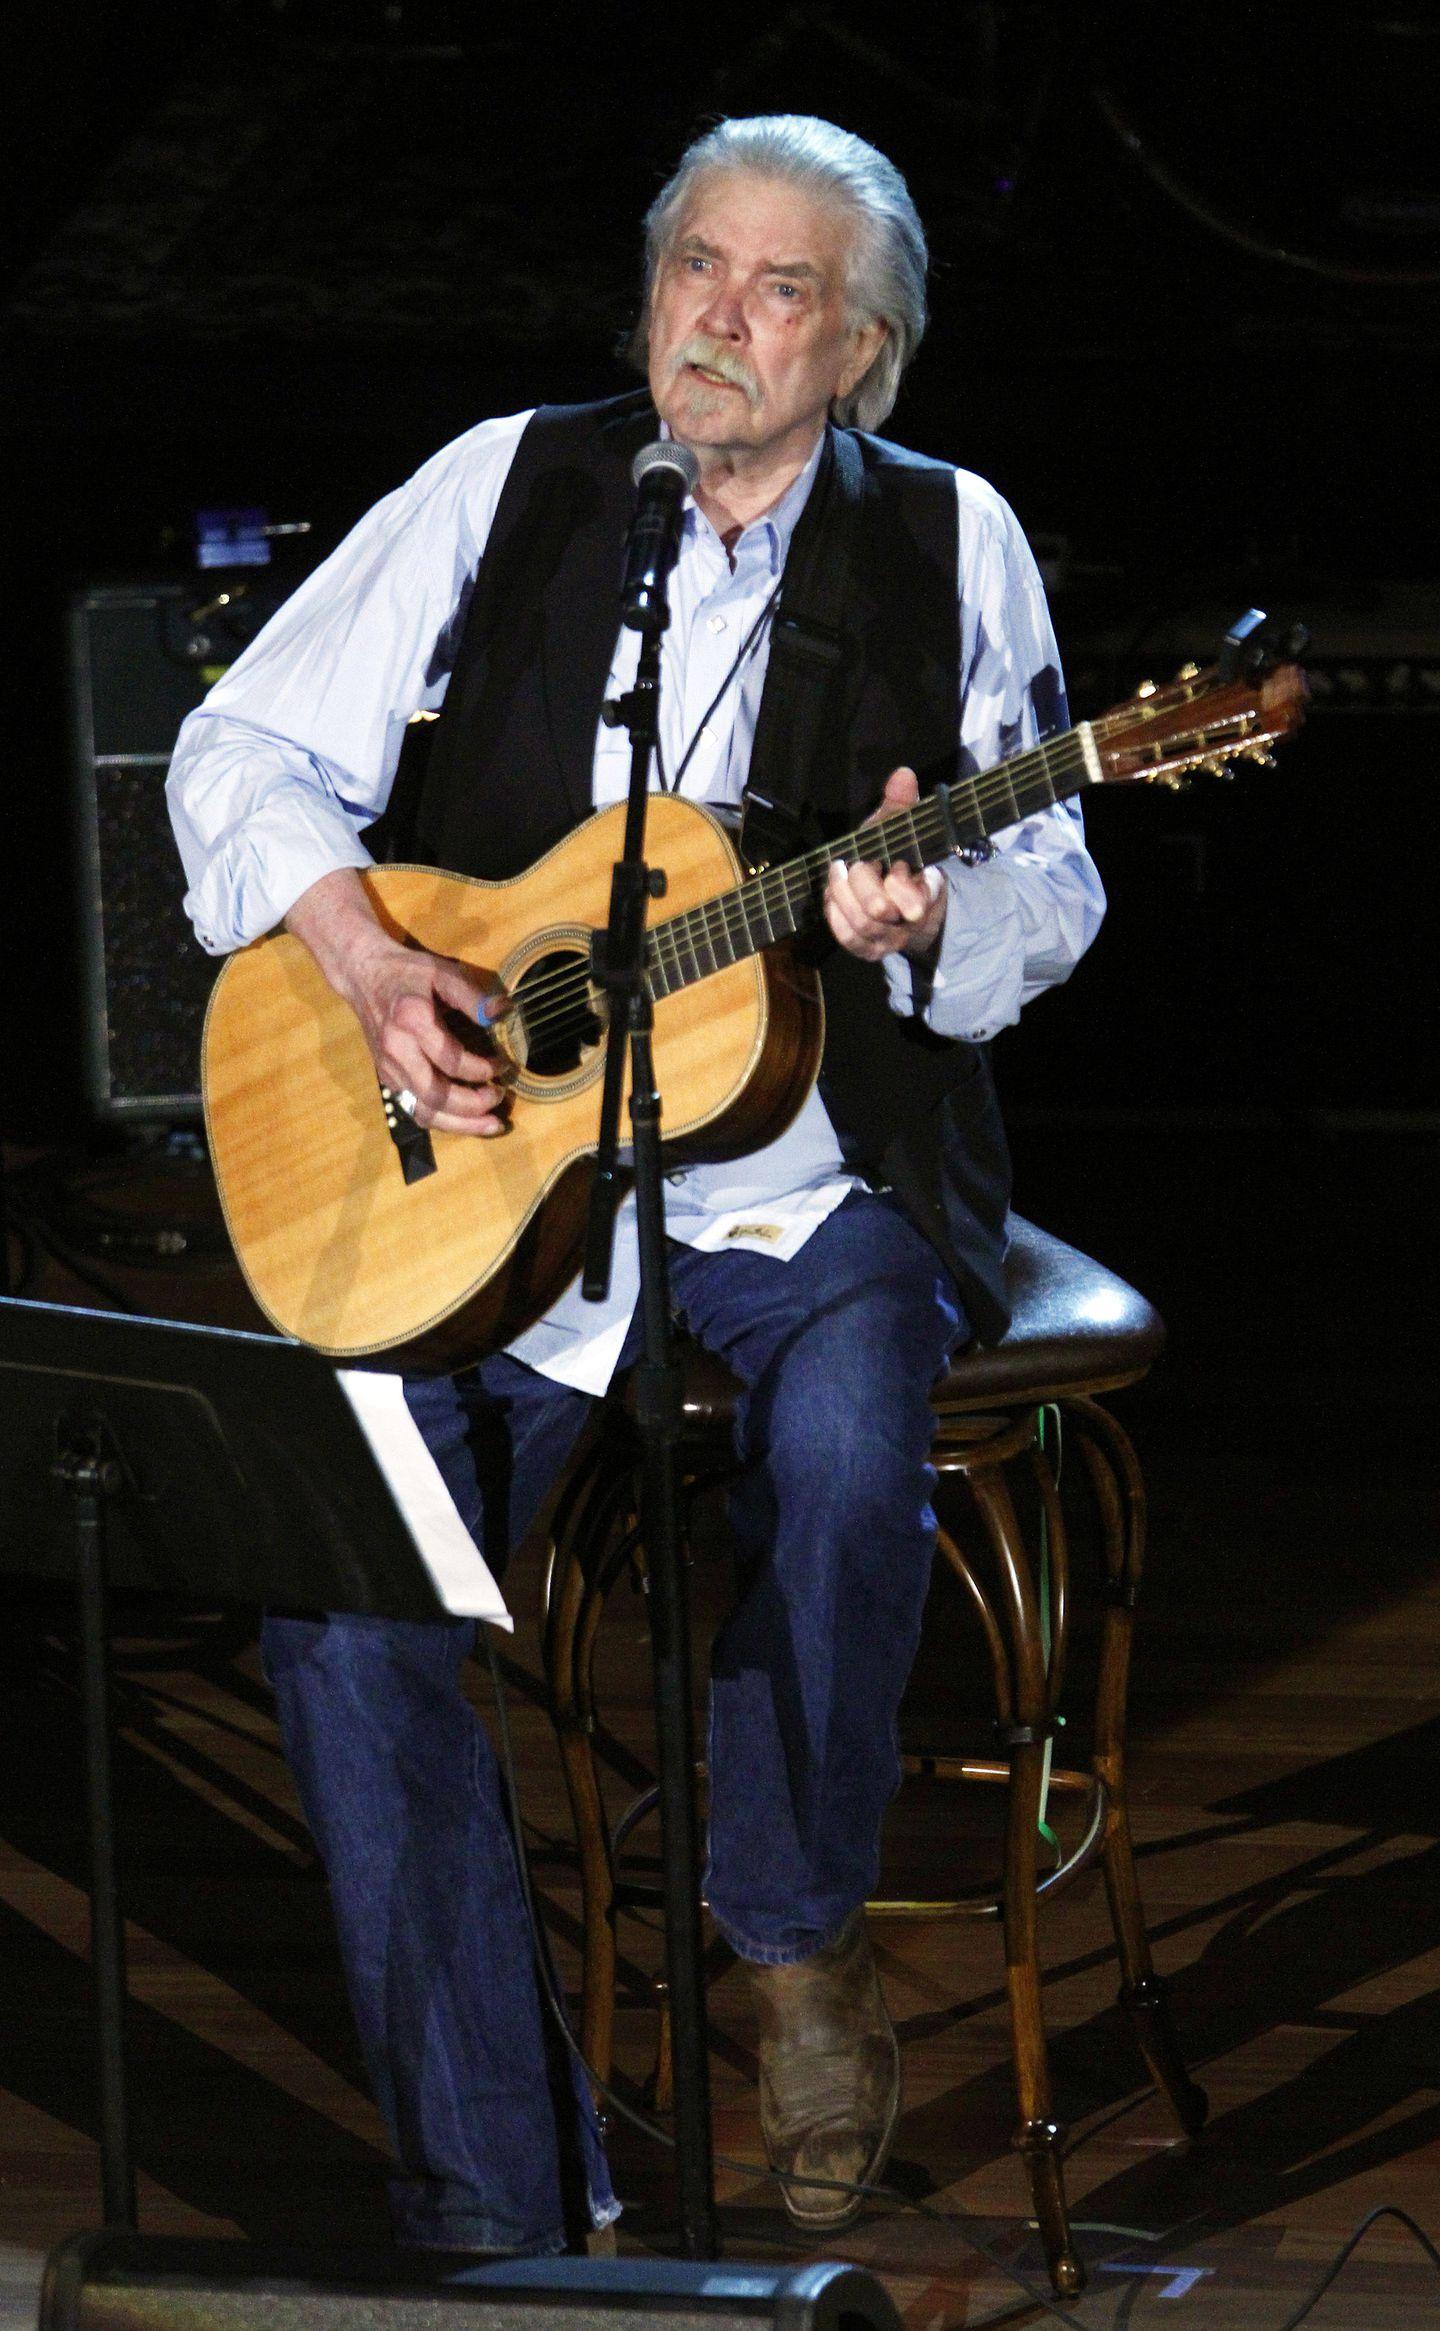 Guy Clark 74 Texas Songwriter Known For Detailed Lush And Imaginative Lyrics The Boston Globe